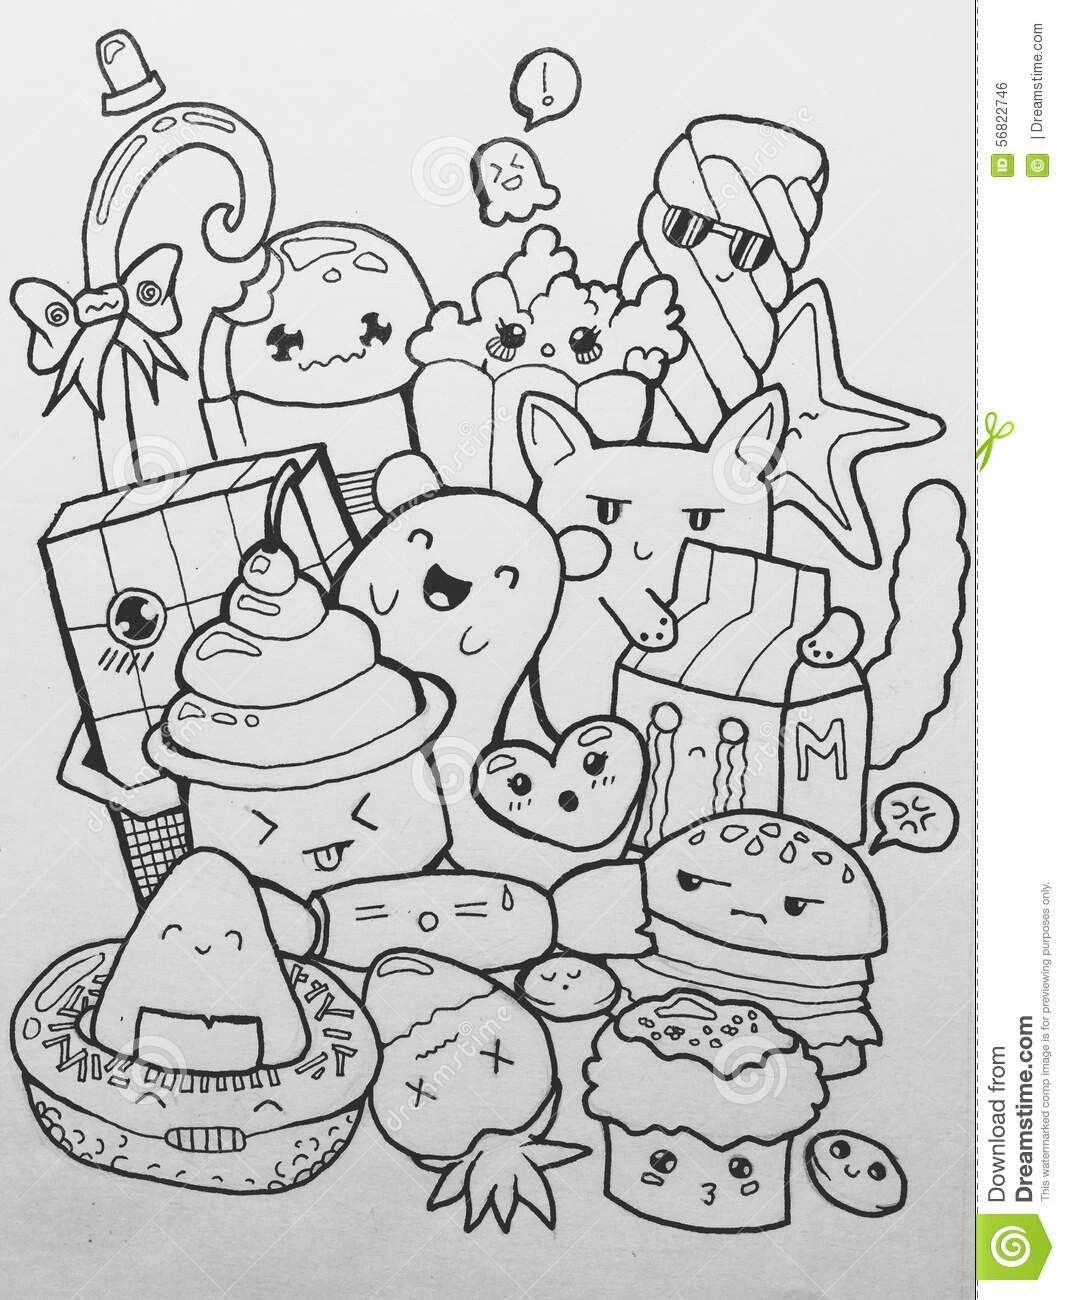 Nor Syafiqah | Doodle Art ❤ | Pinterest | Malvorlagen für ...